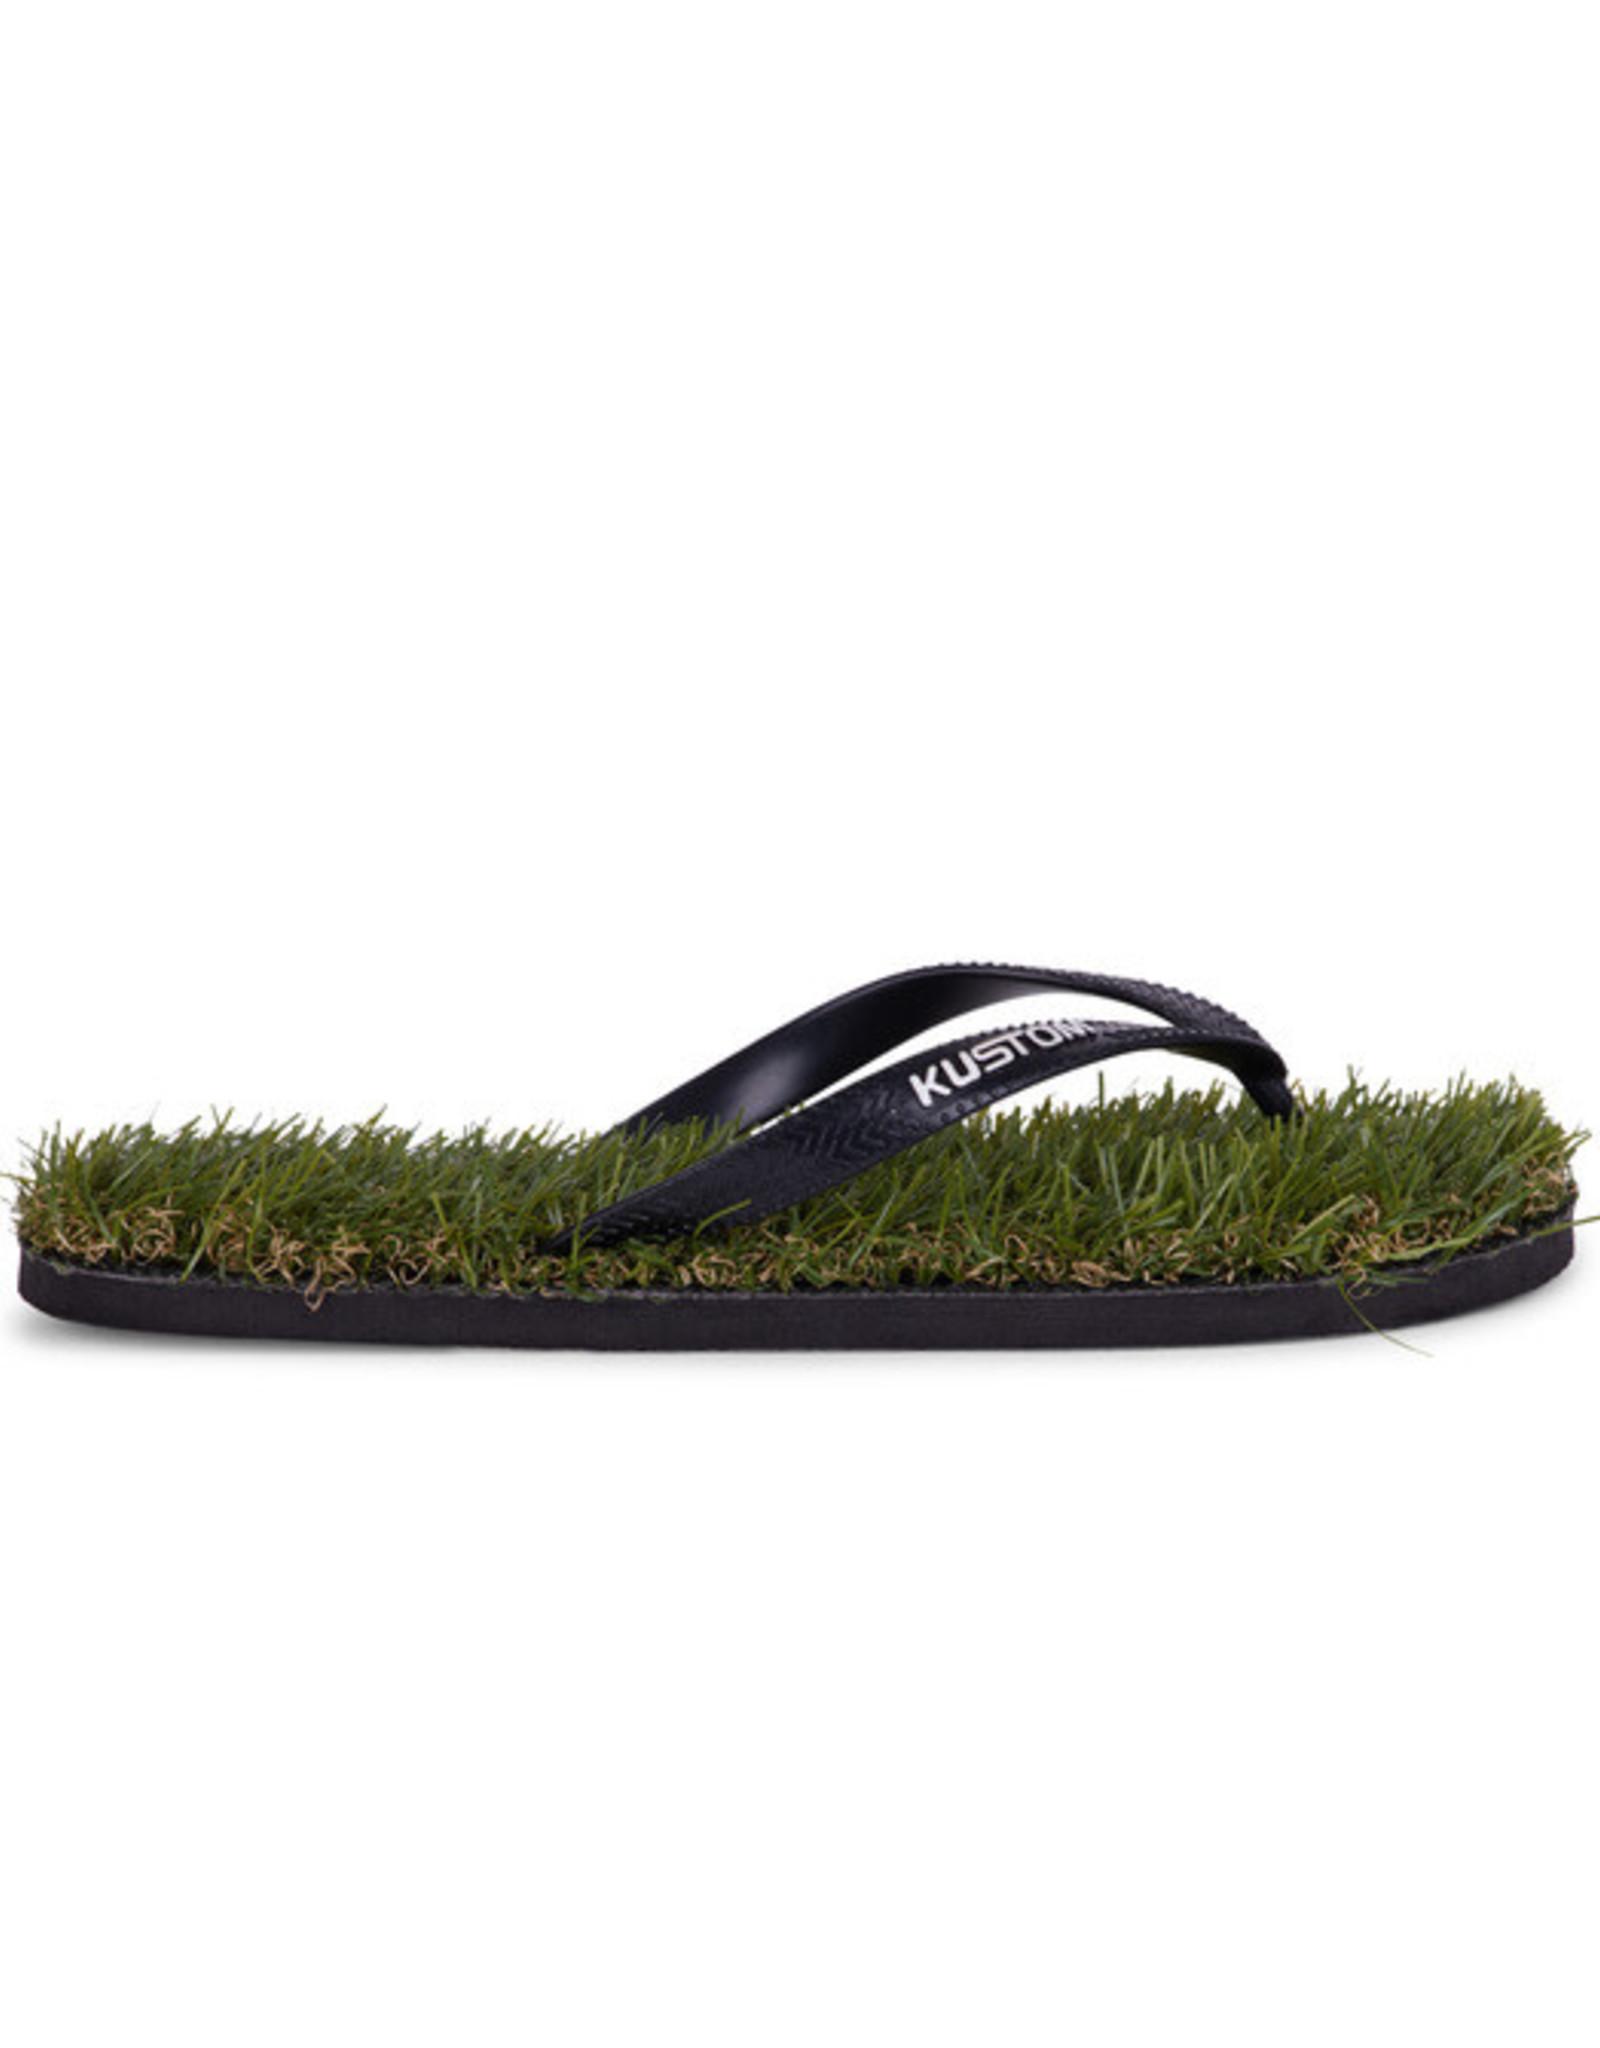 KUSTOM Keep on the Grass Thongs